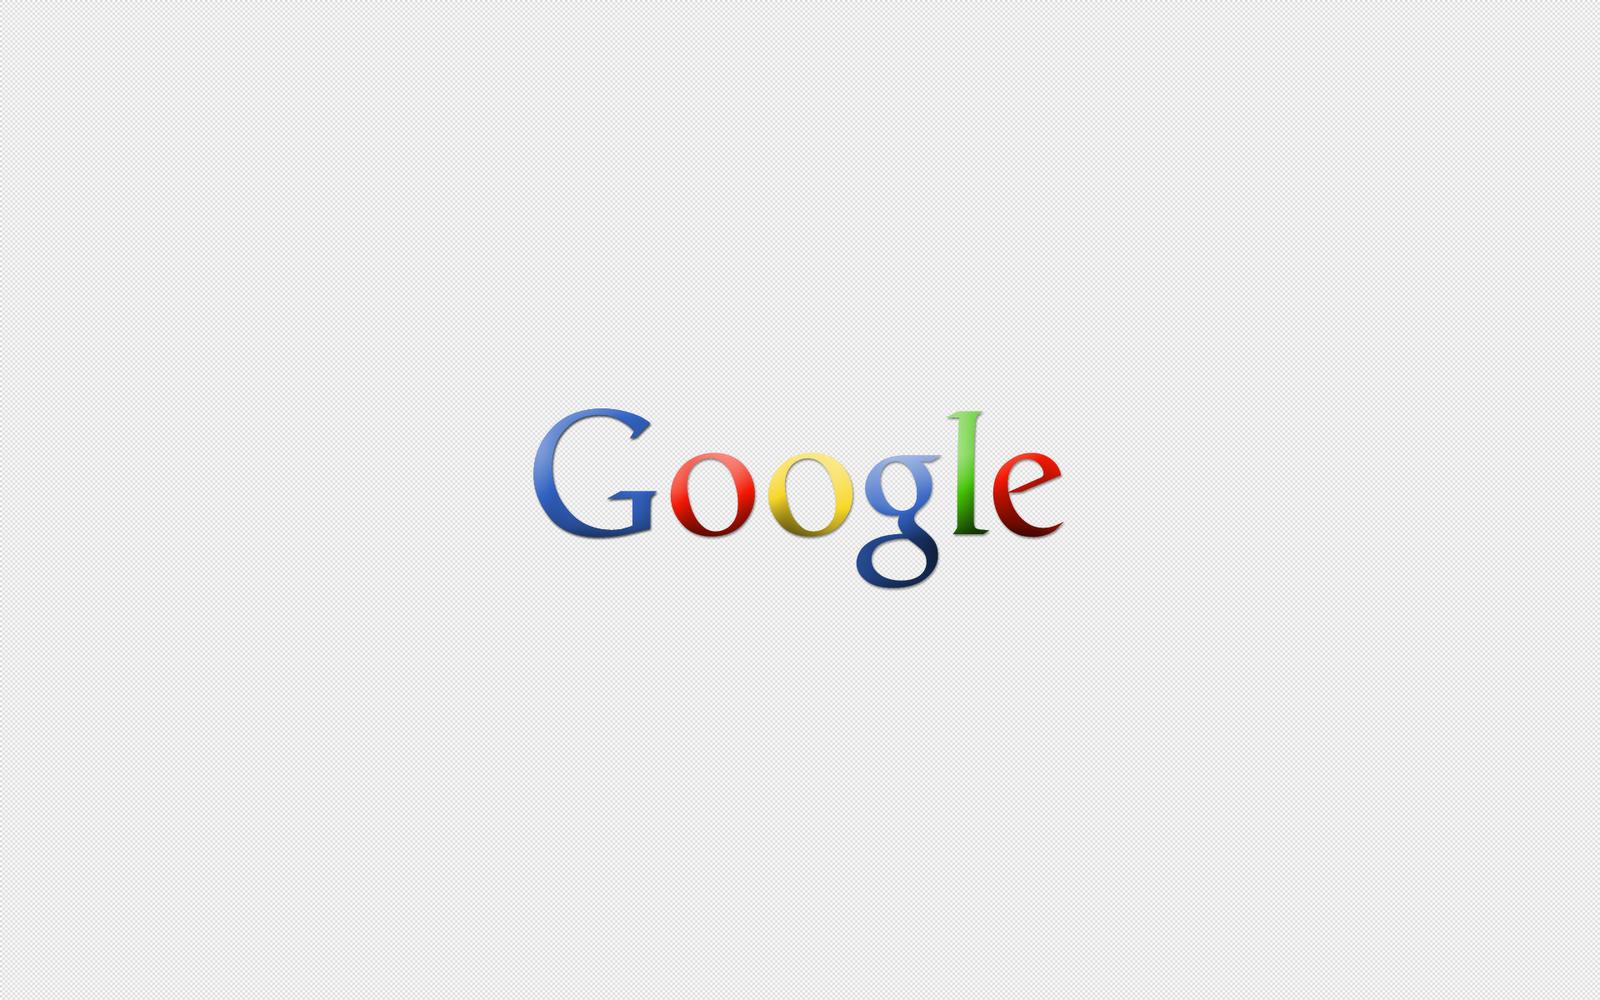 Google chrome themes jesus christ - Google Wallpaper Google Wallpaper Background Google Wallpaper Changer Google Wallpaper Themes Google Chrome Wallpapers Google Skins Wallpaper Google